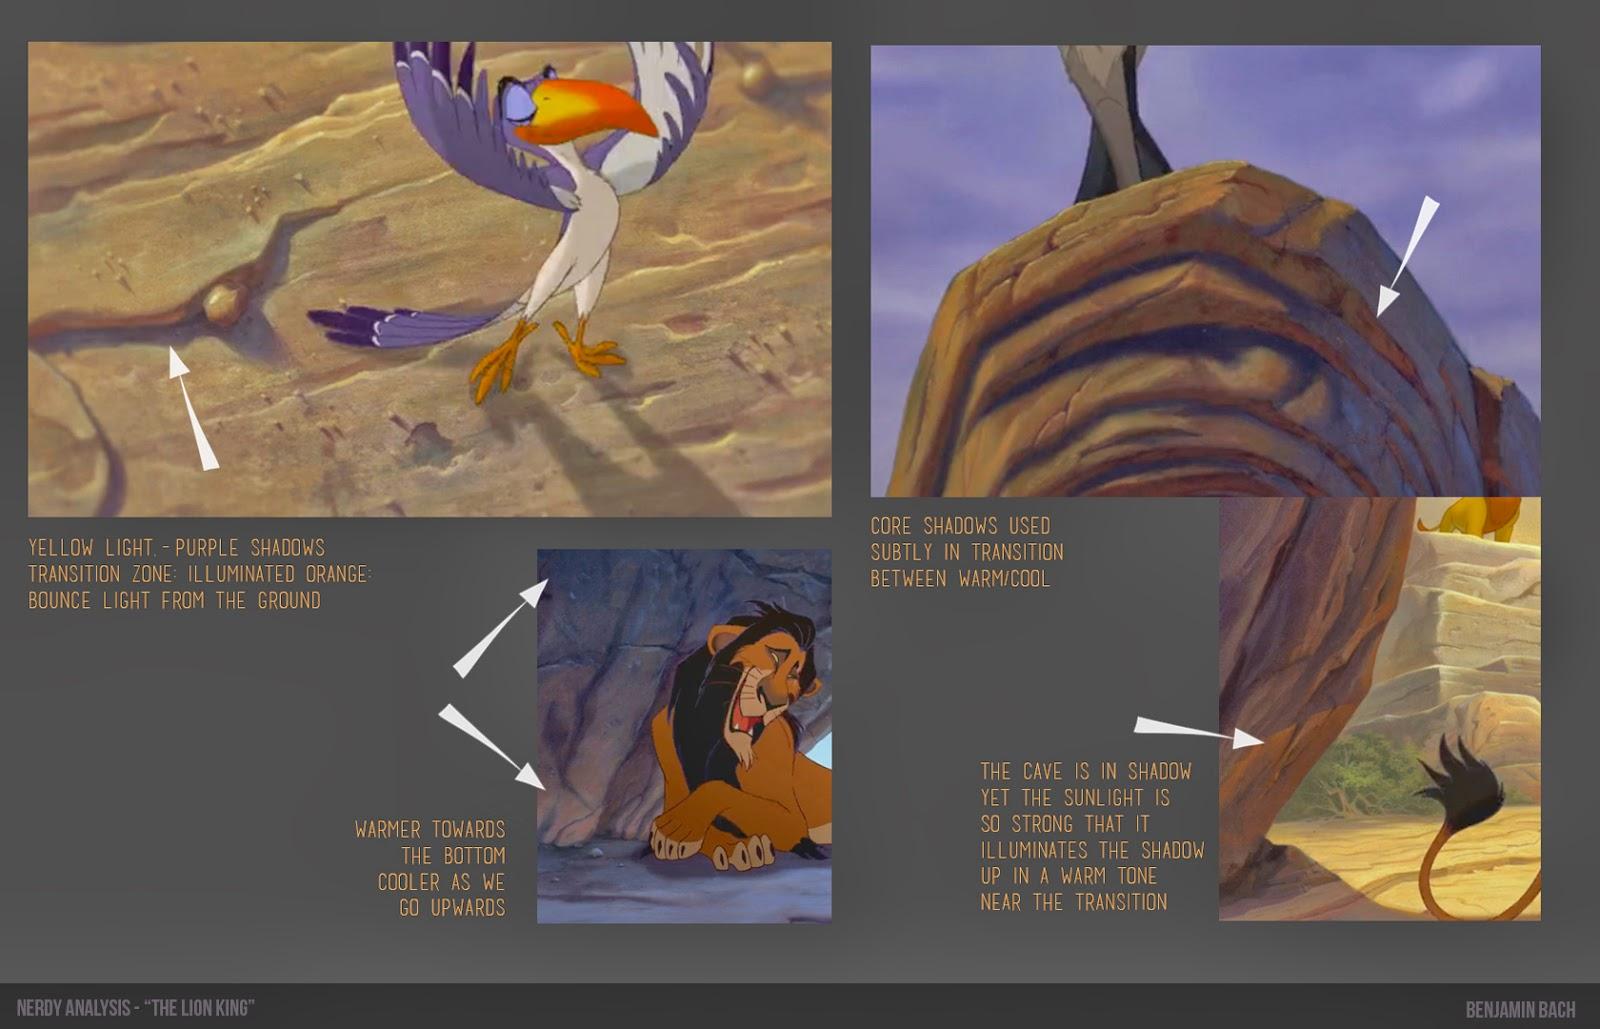 Liger - A Lion & Tigress Hybrid